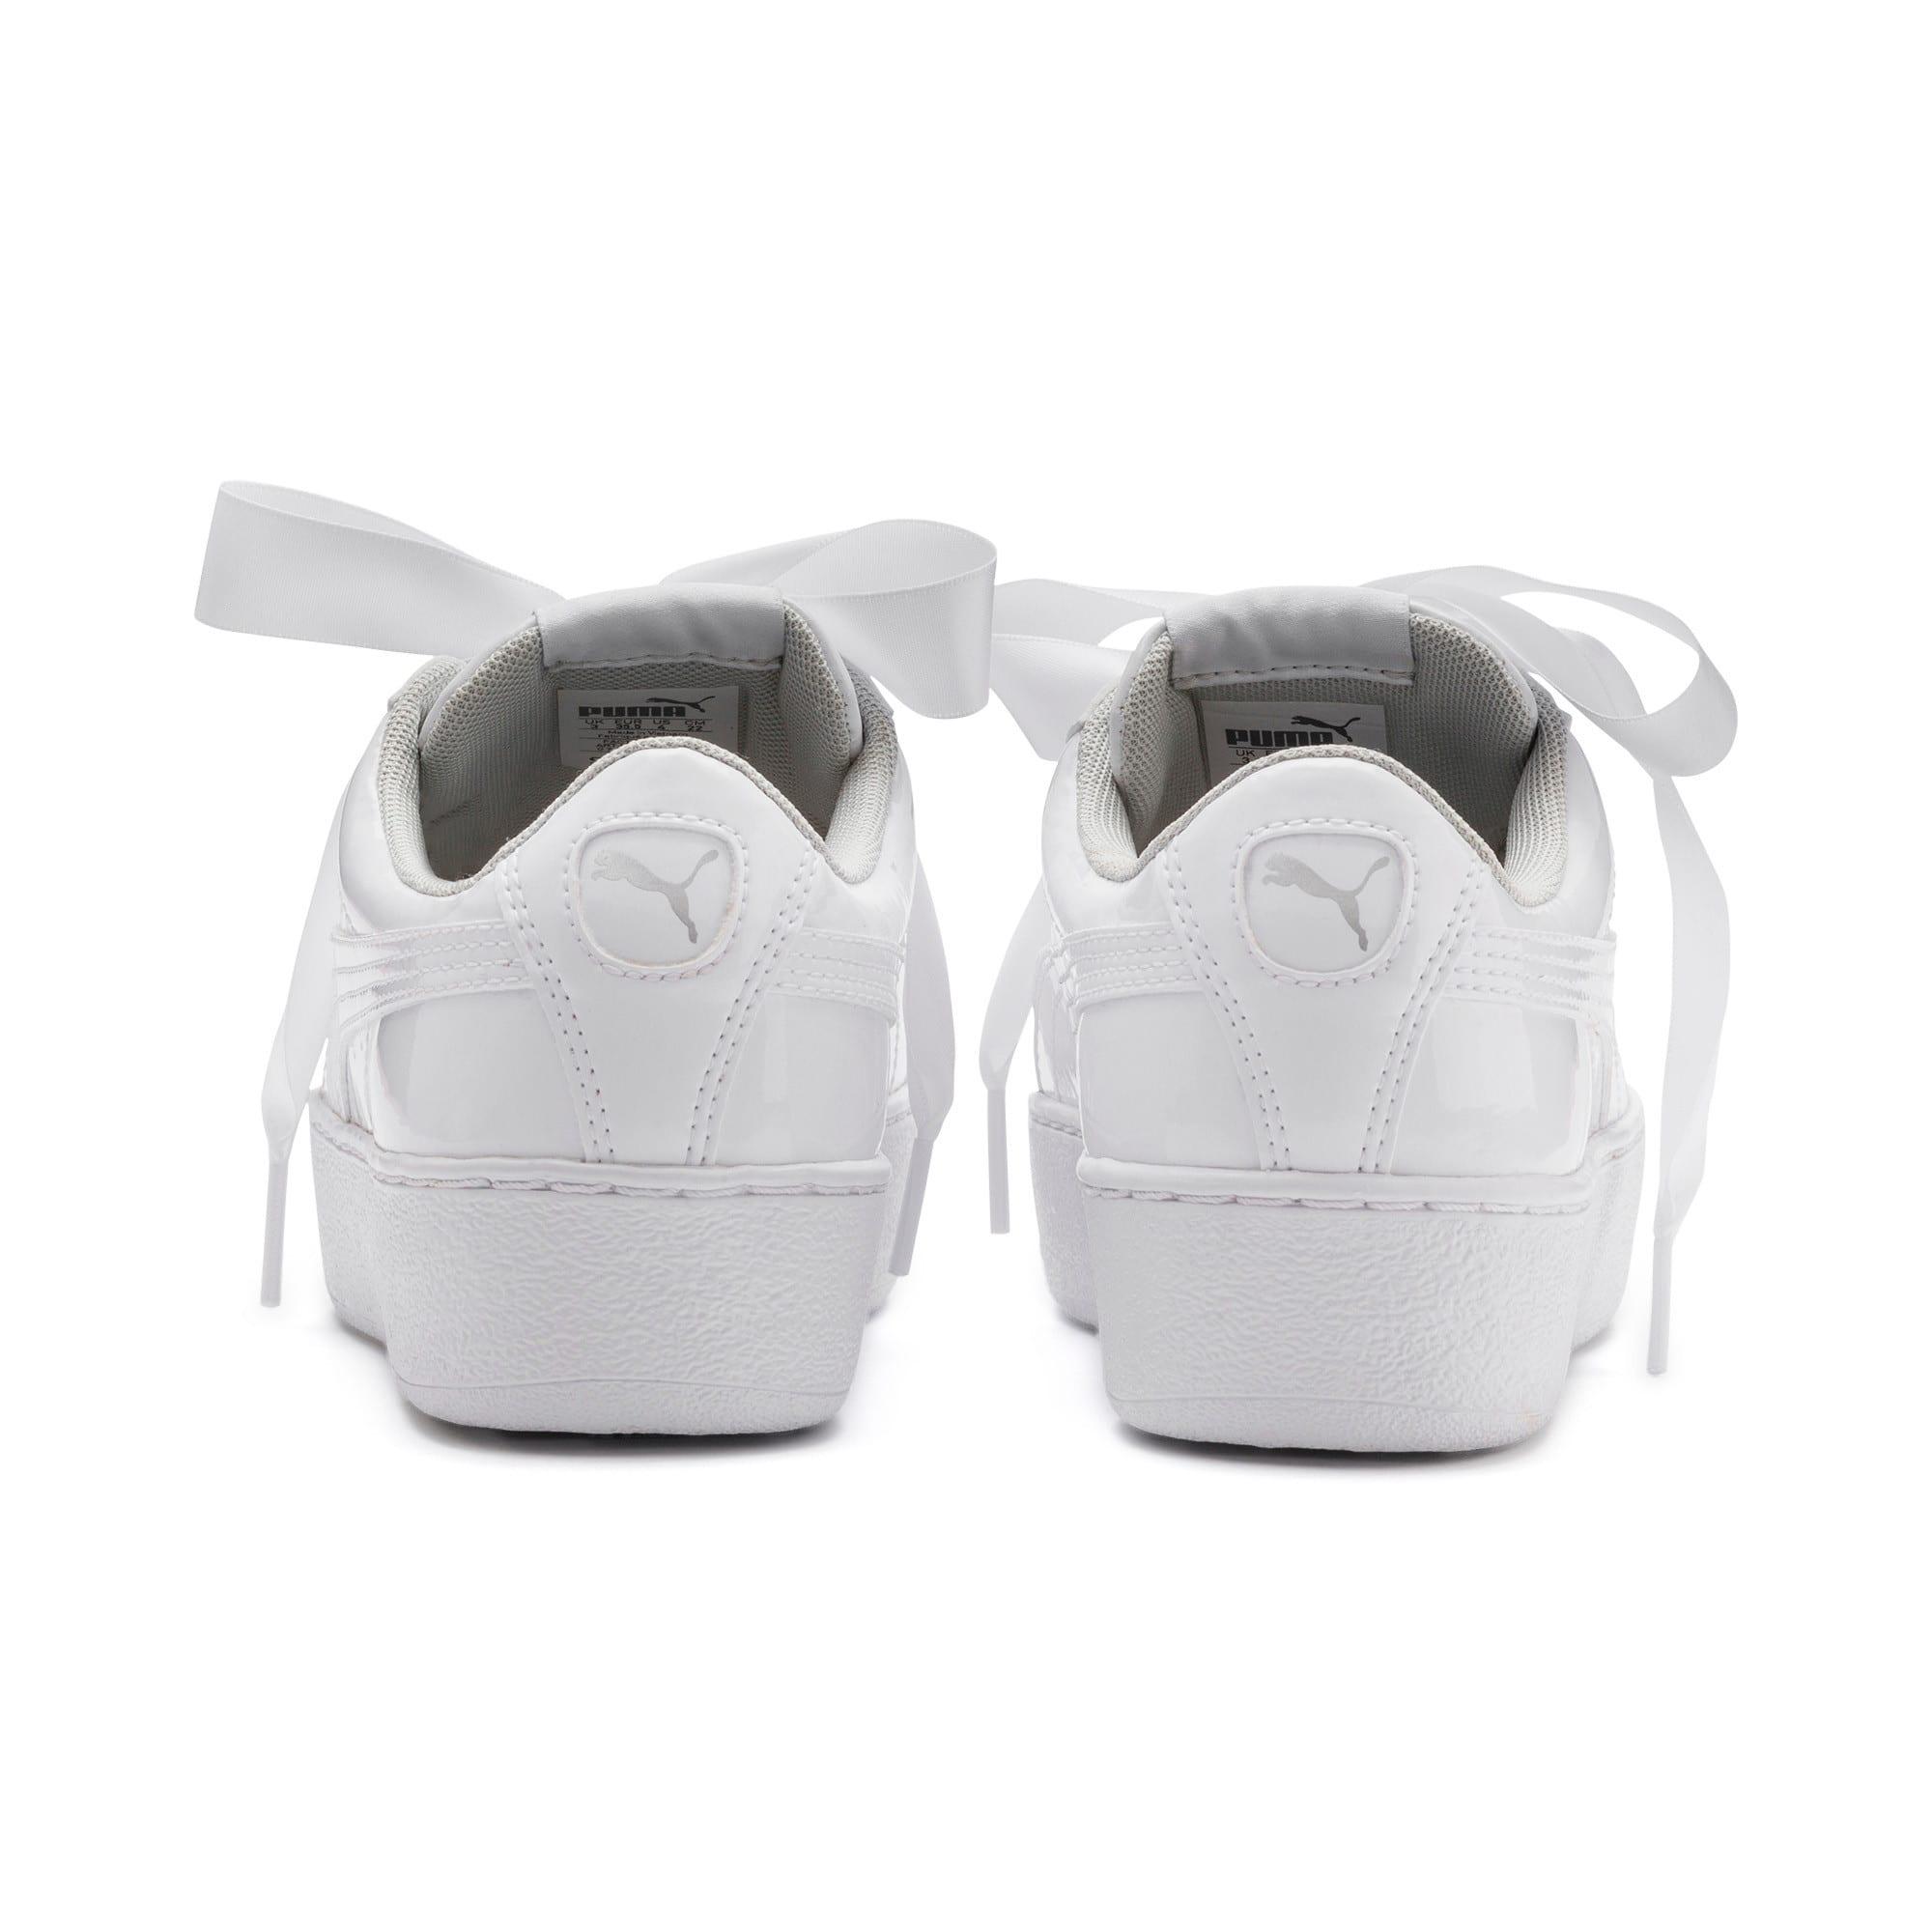 Thumbnail 3 of Vikky Platform Ribbon Patent Girls' Trainers, Puma White-Puma White, medium